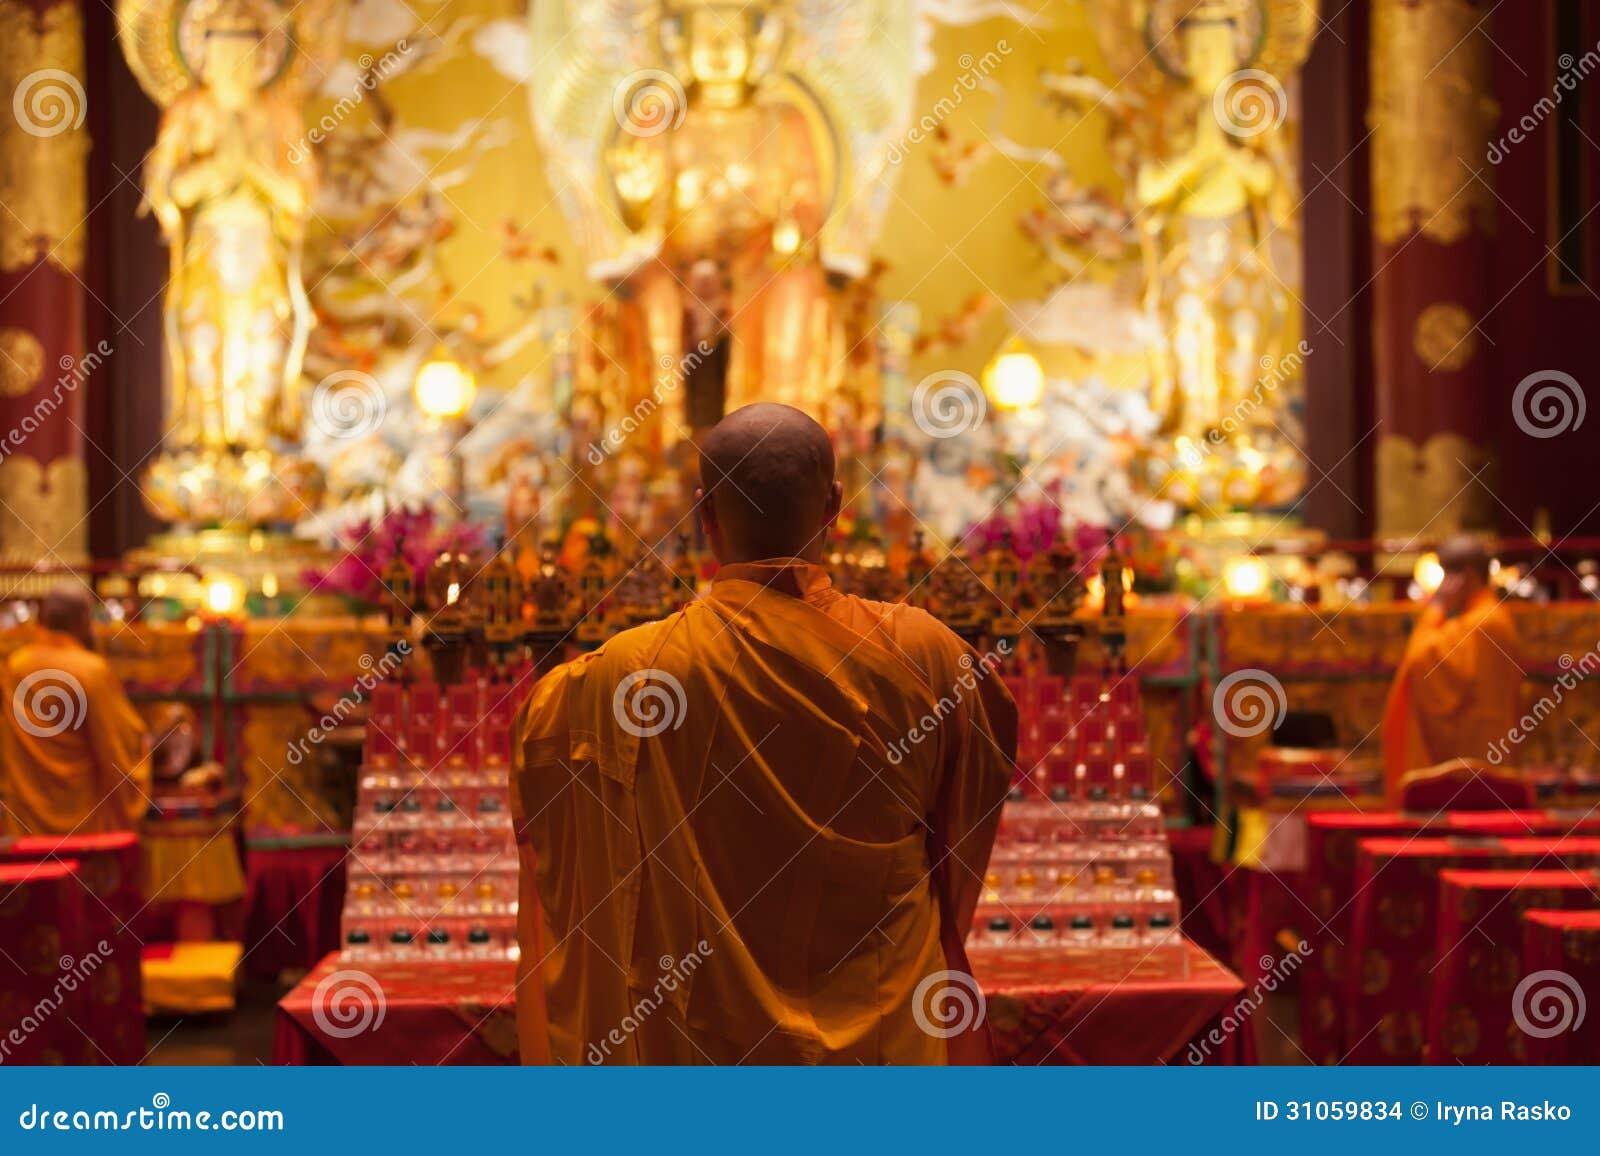 Buddha im Zahn-Relikt-Tempel in China-Stadt, Singapur